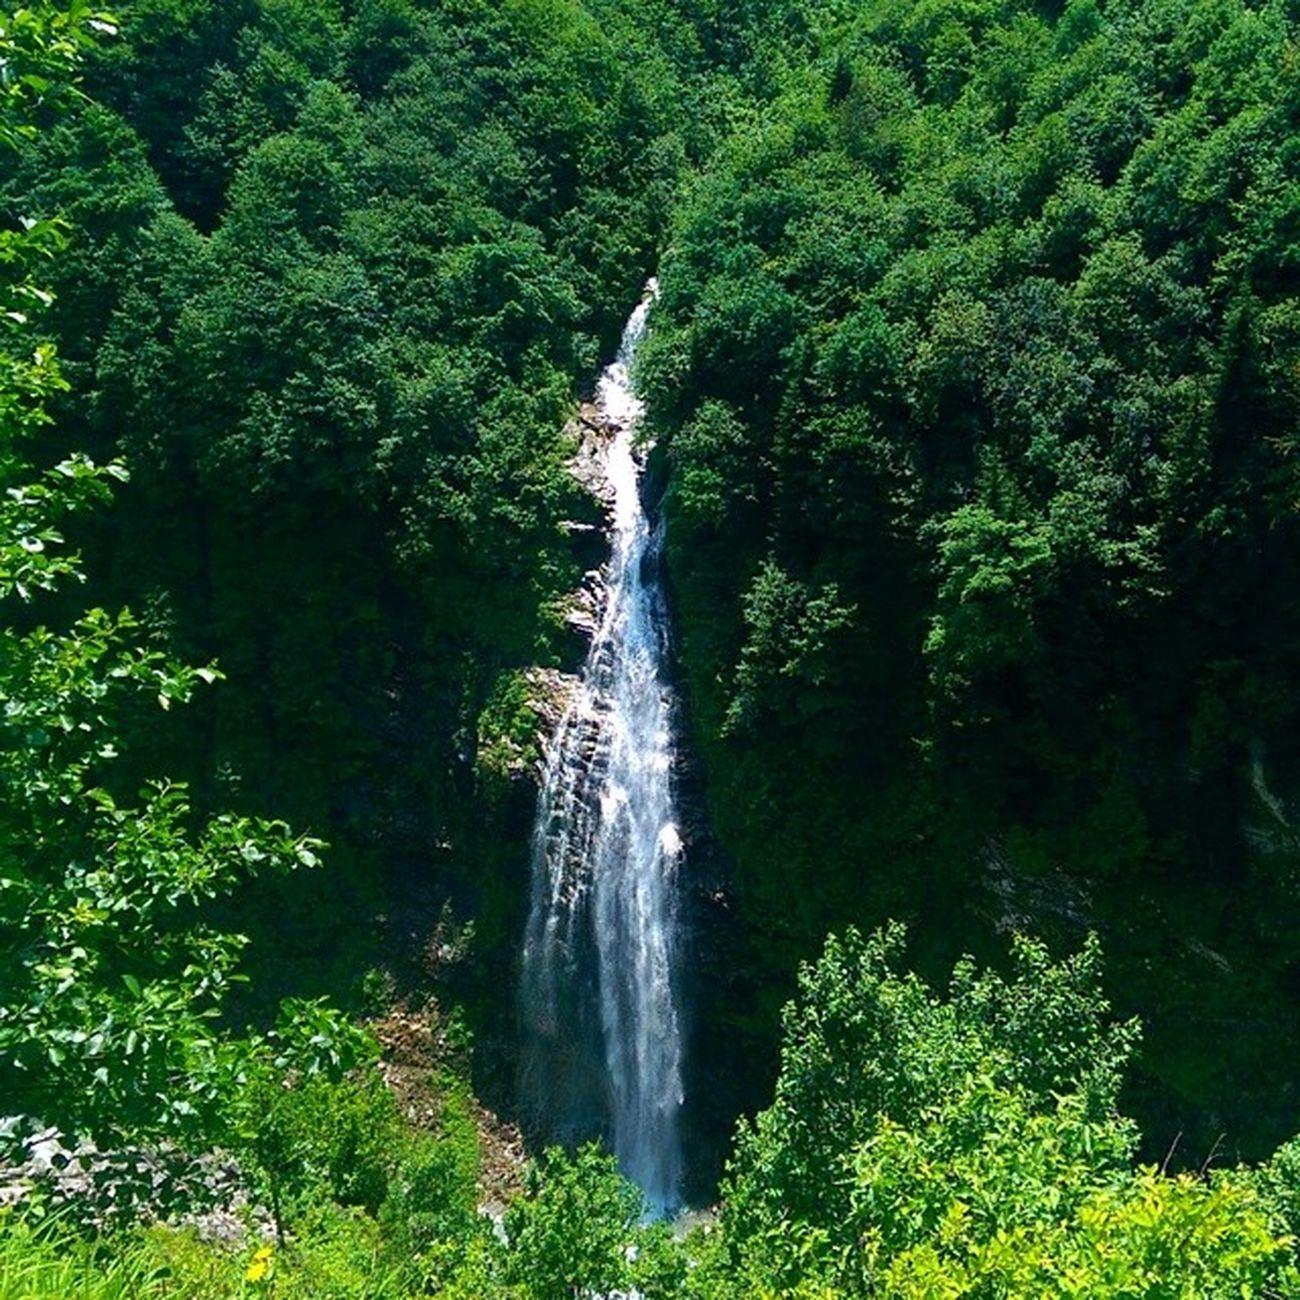 Firtına Dere Nehir Irmak river nature doga manzara water spring travel karadeniz camlihemsin ayder rize selale waterfall